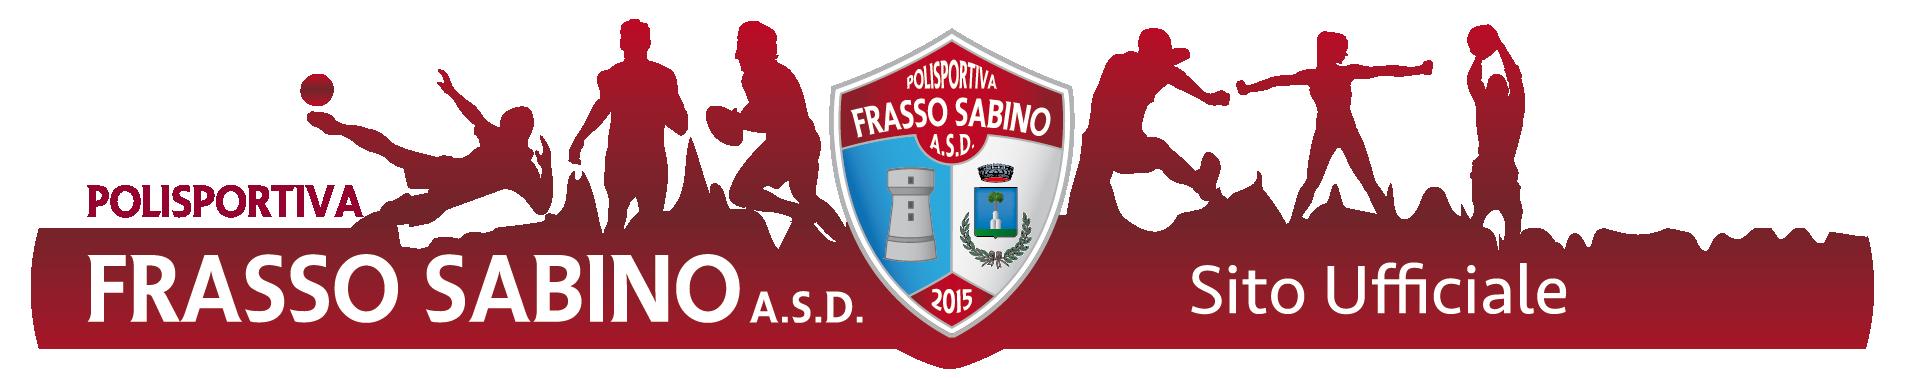 Polisportiva Frasso Sabino ASD